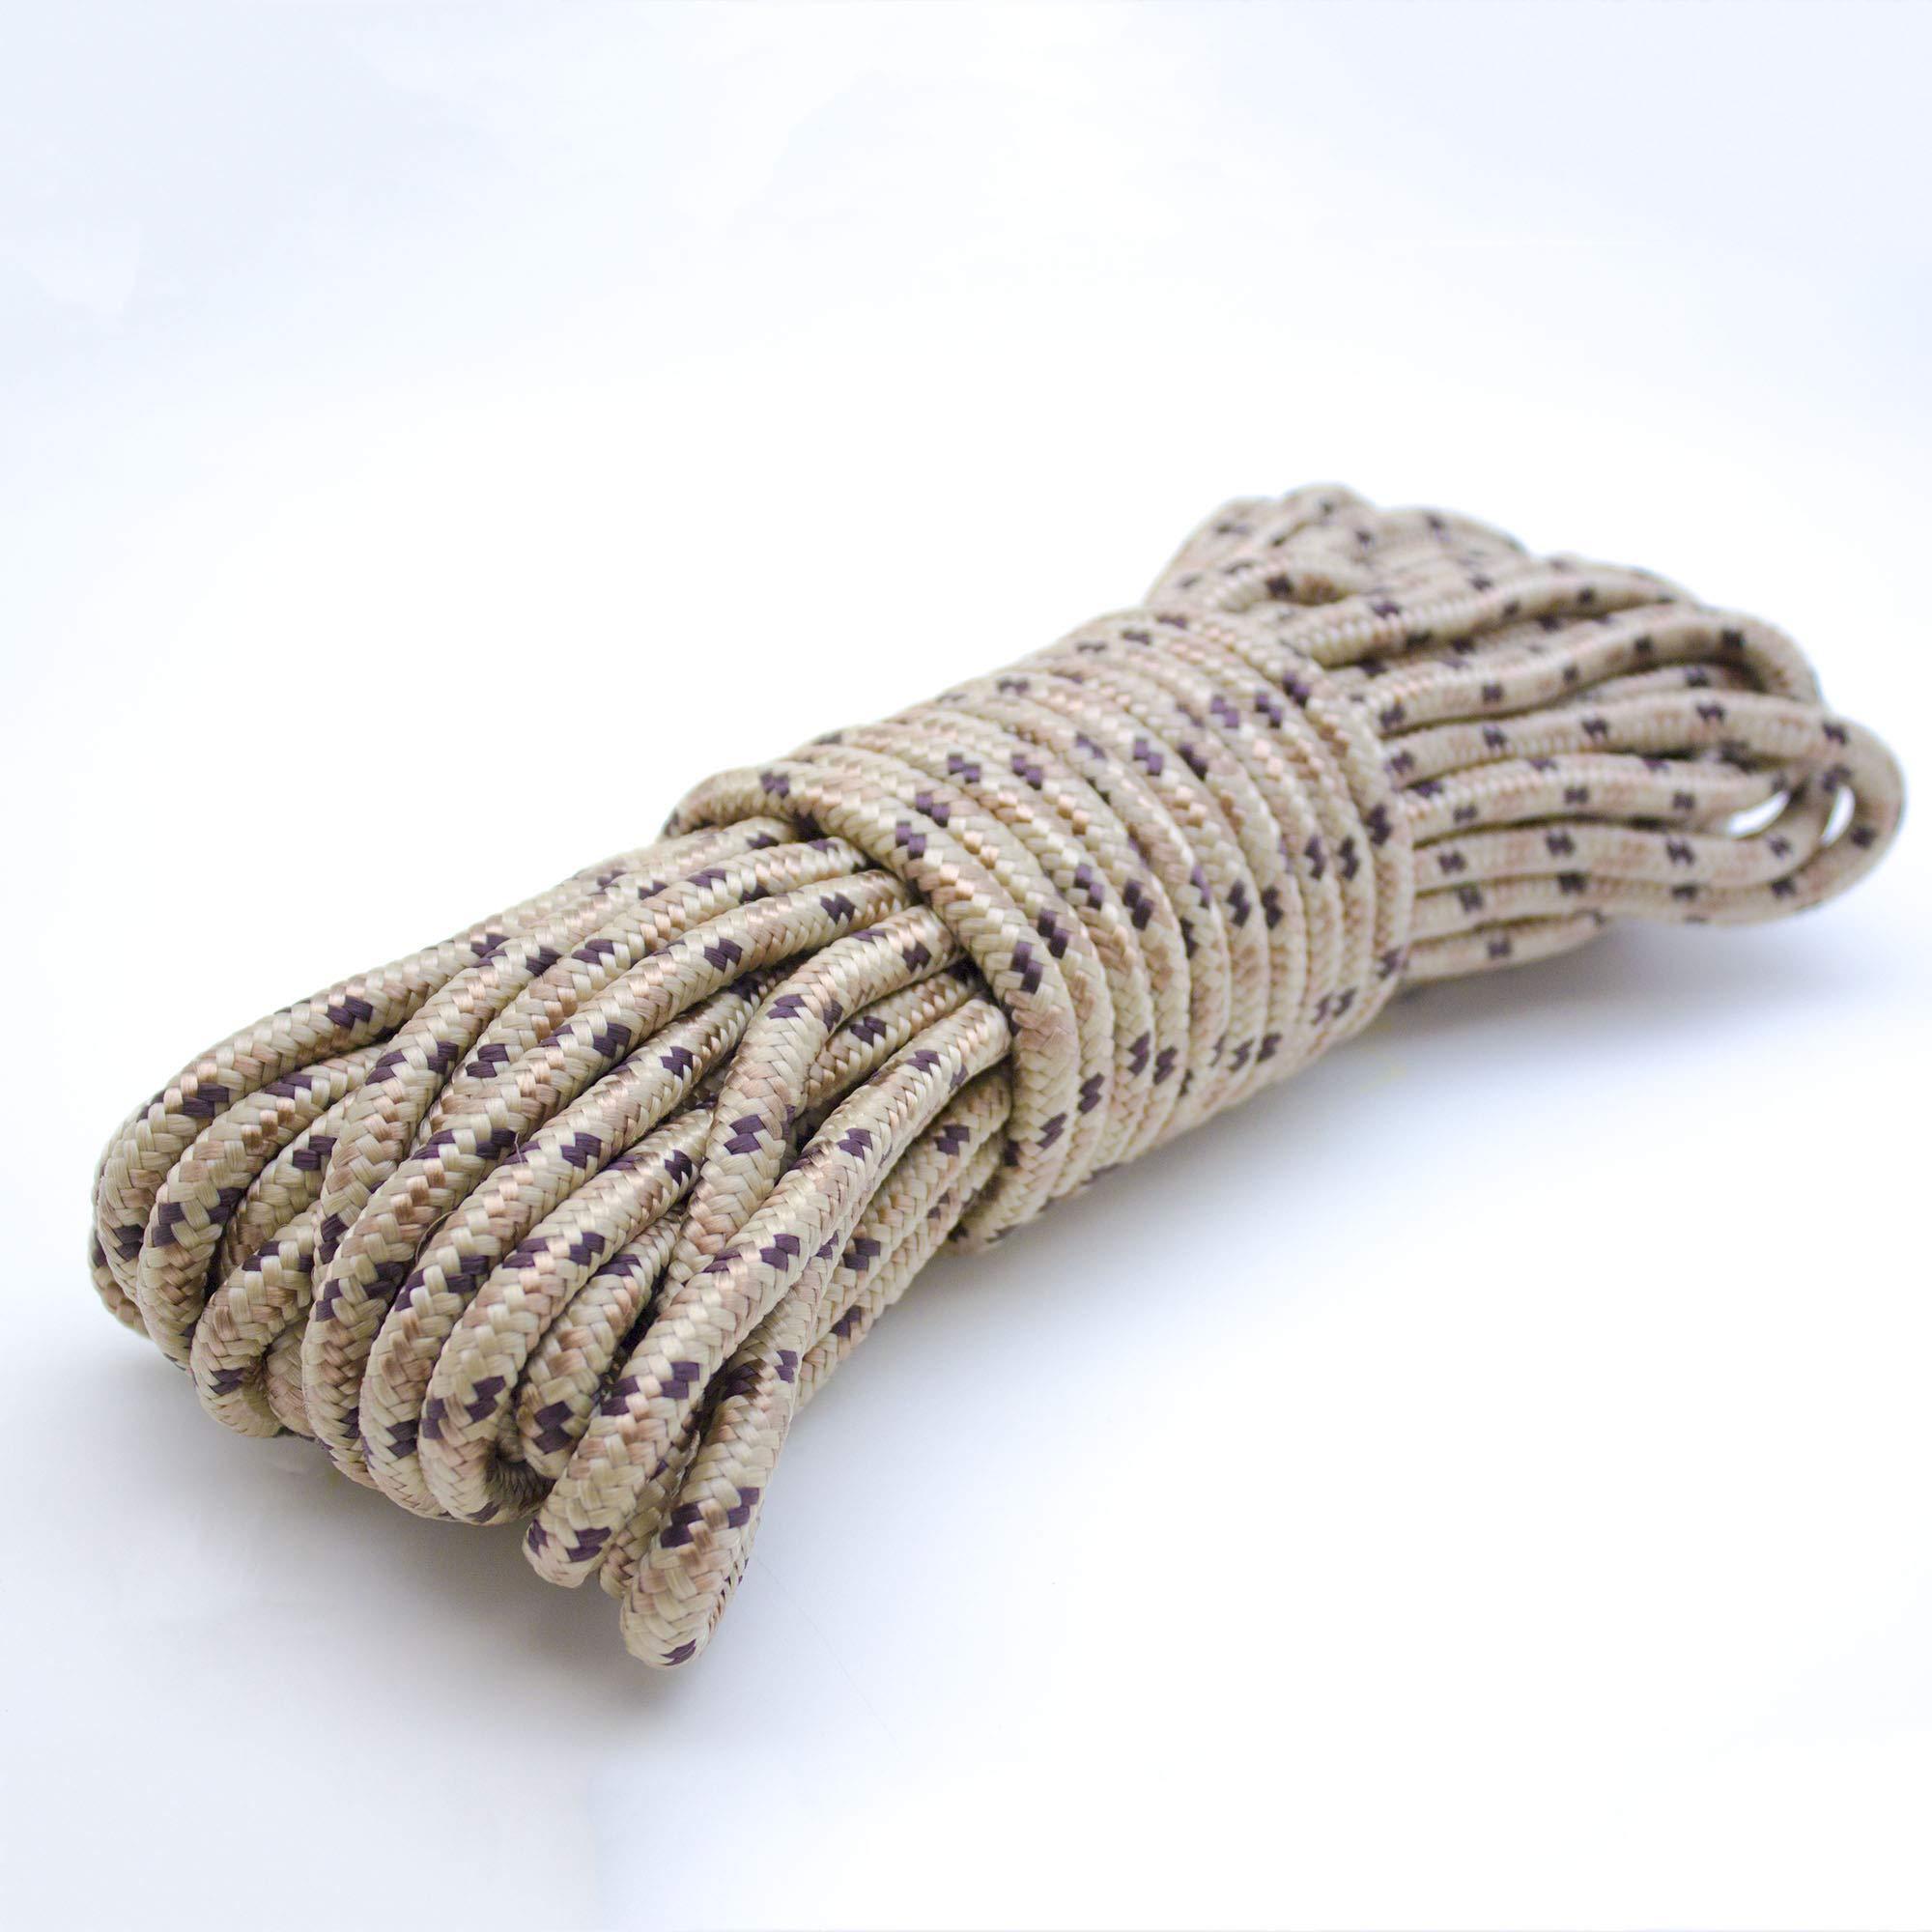 Emergency Zone 9mm (3/8 inch) Nylon Braided, 50 Foot, Multi-Purpose Rope. Camouflage 2 Pack